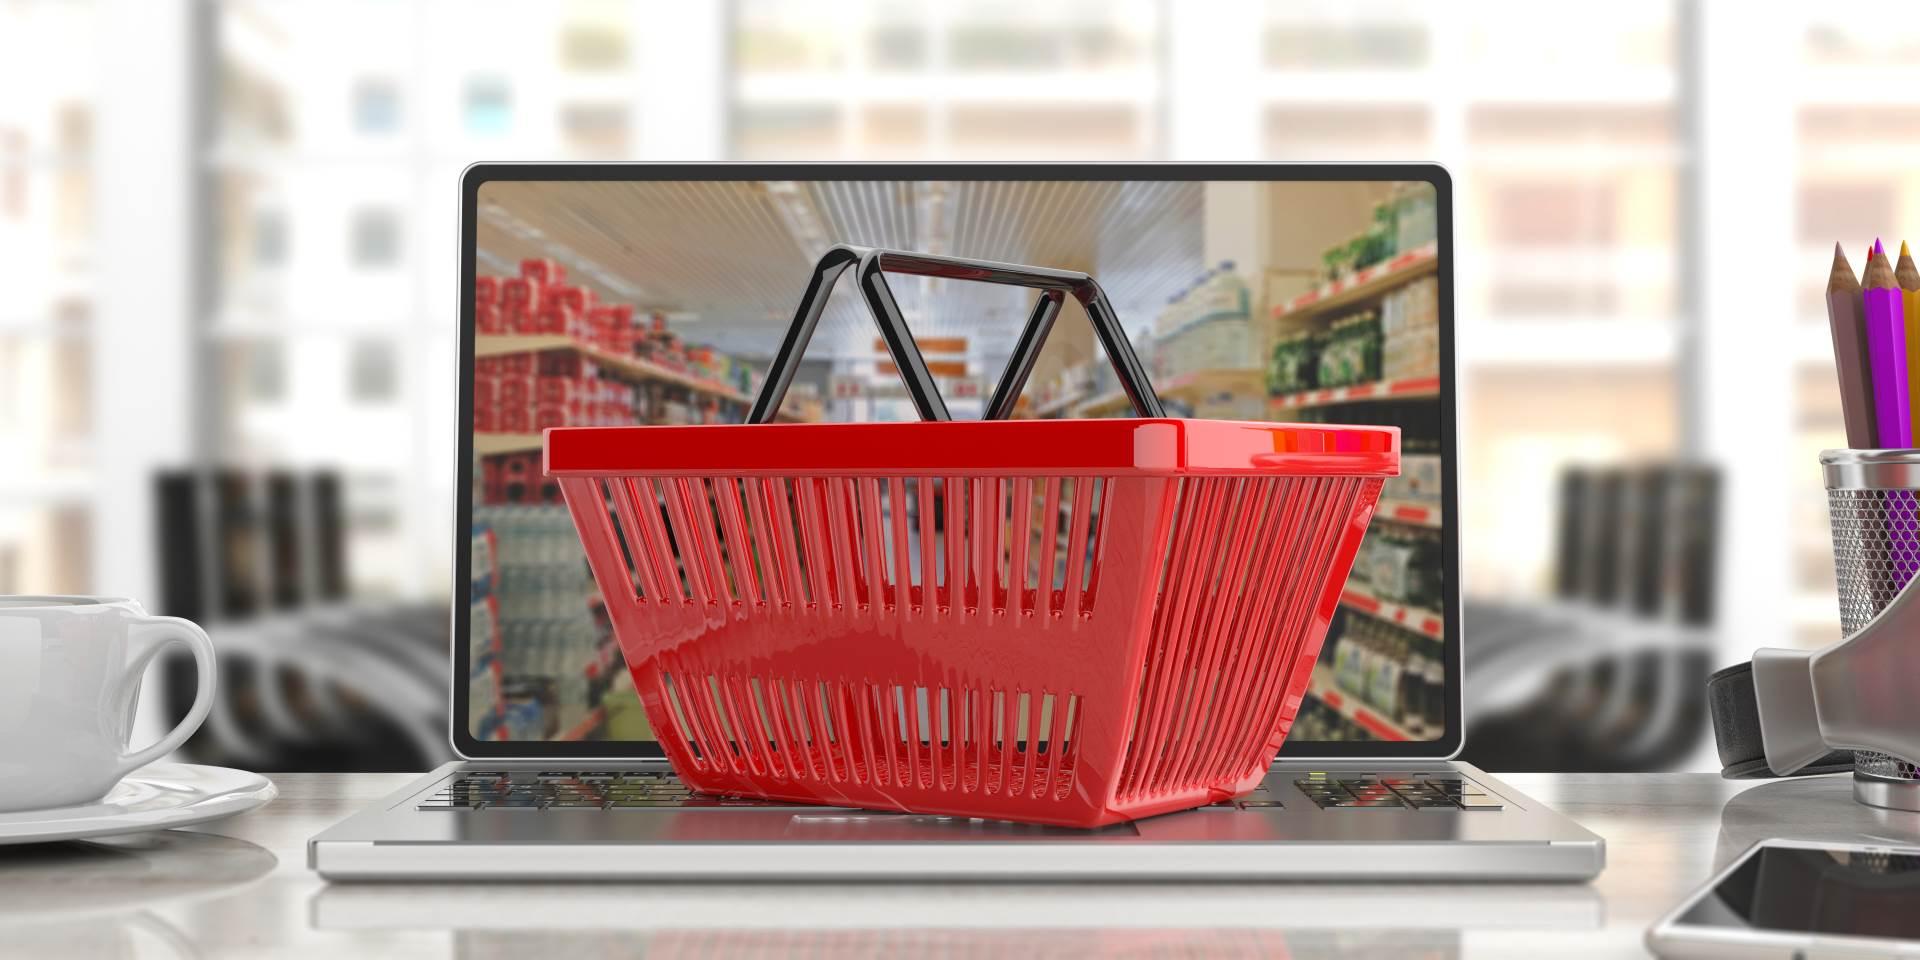 kupovina, trgovina, shopping, eshop, market, korpa, prodavnica